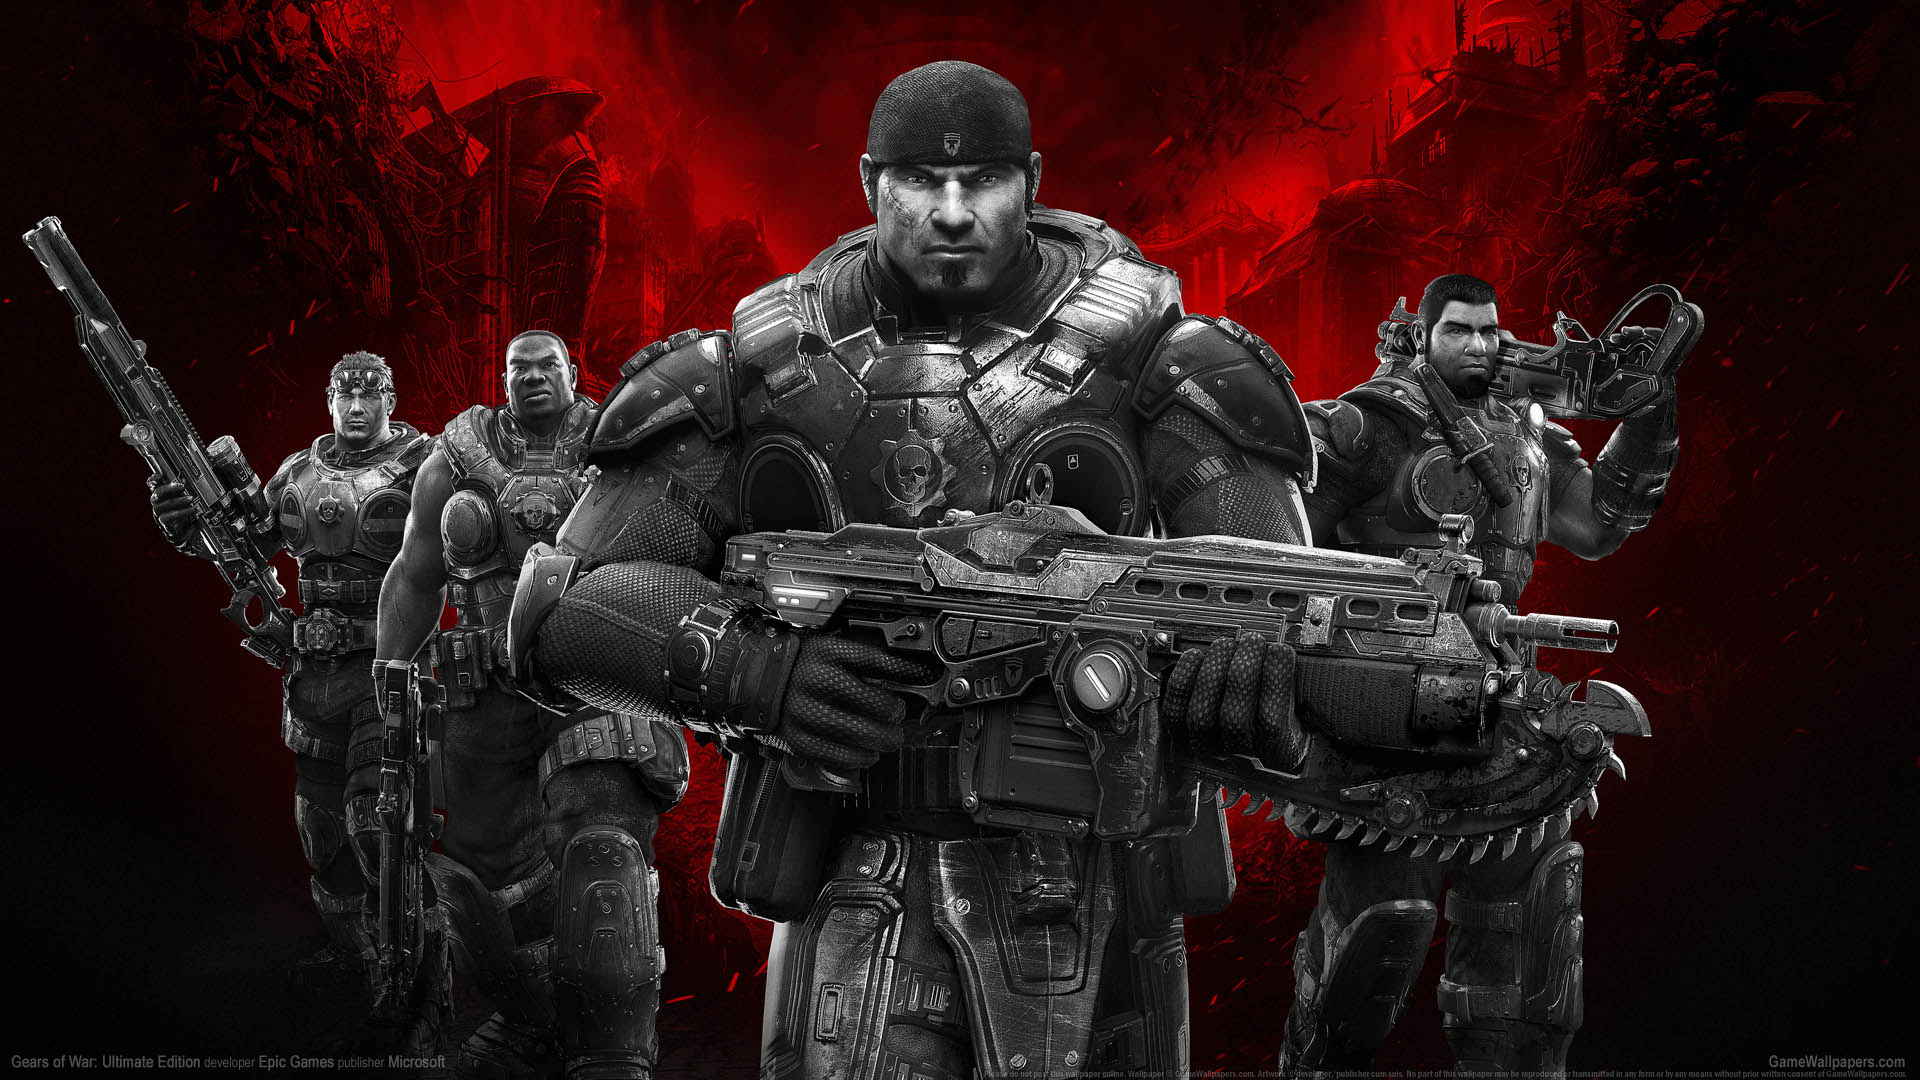 Gears of War: Ultimate Edition wallpaper 01 1920x1080